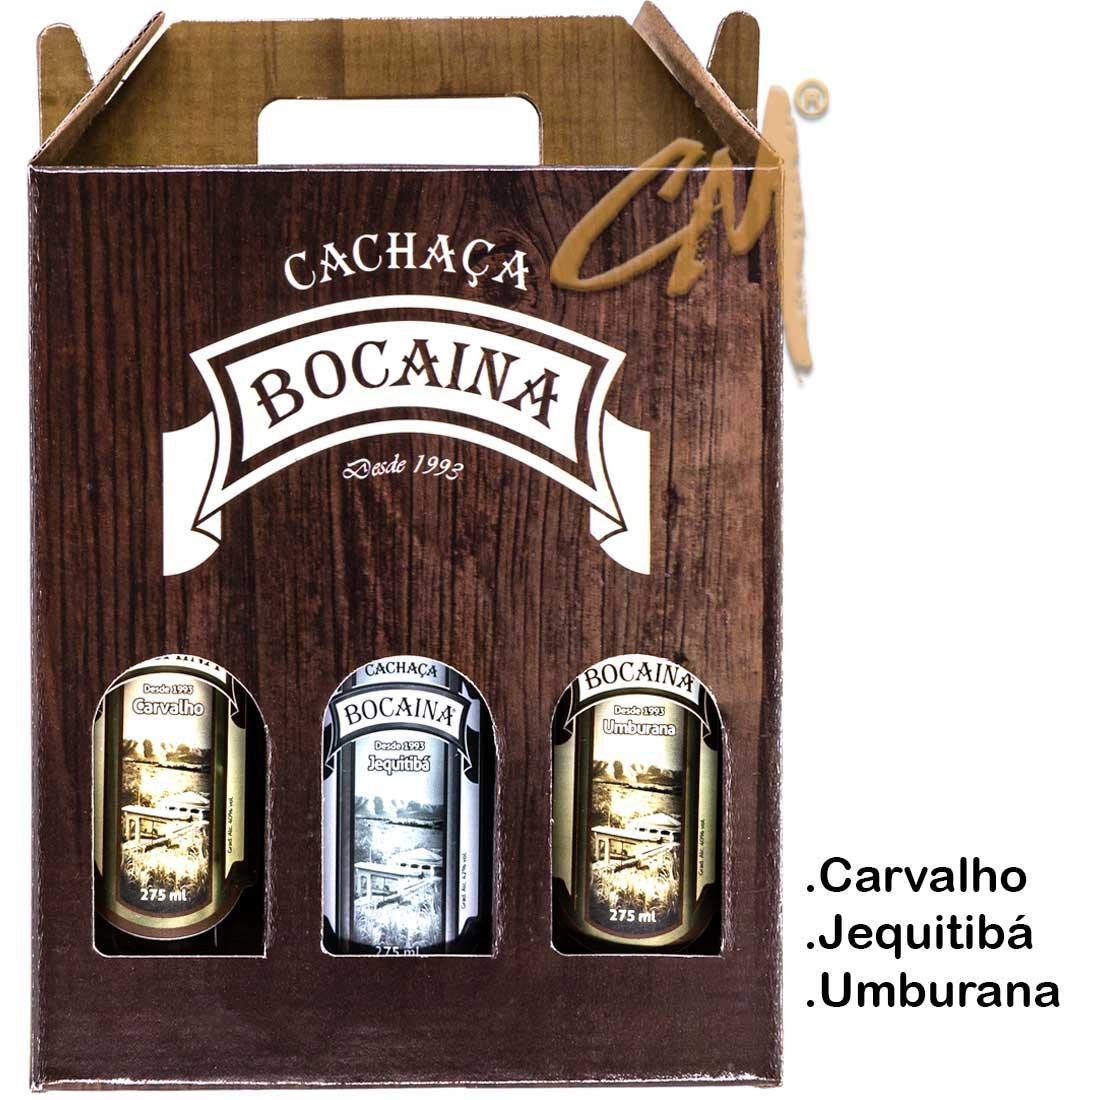 Cachaça Bocaina 275 ml - Kit Carvalho-Jequitibá-Umburana  (Lavras - MG)